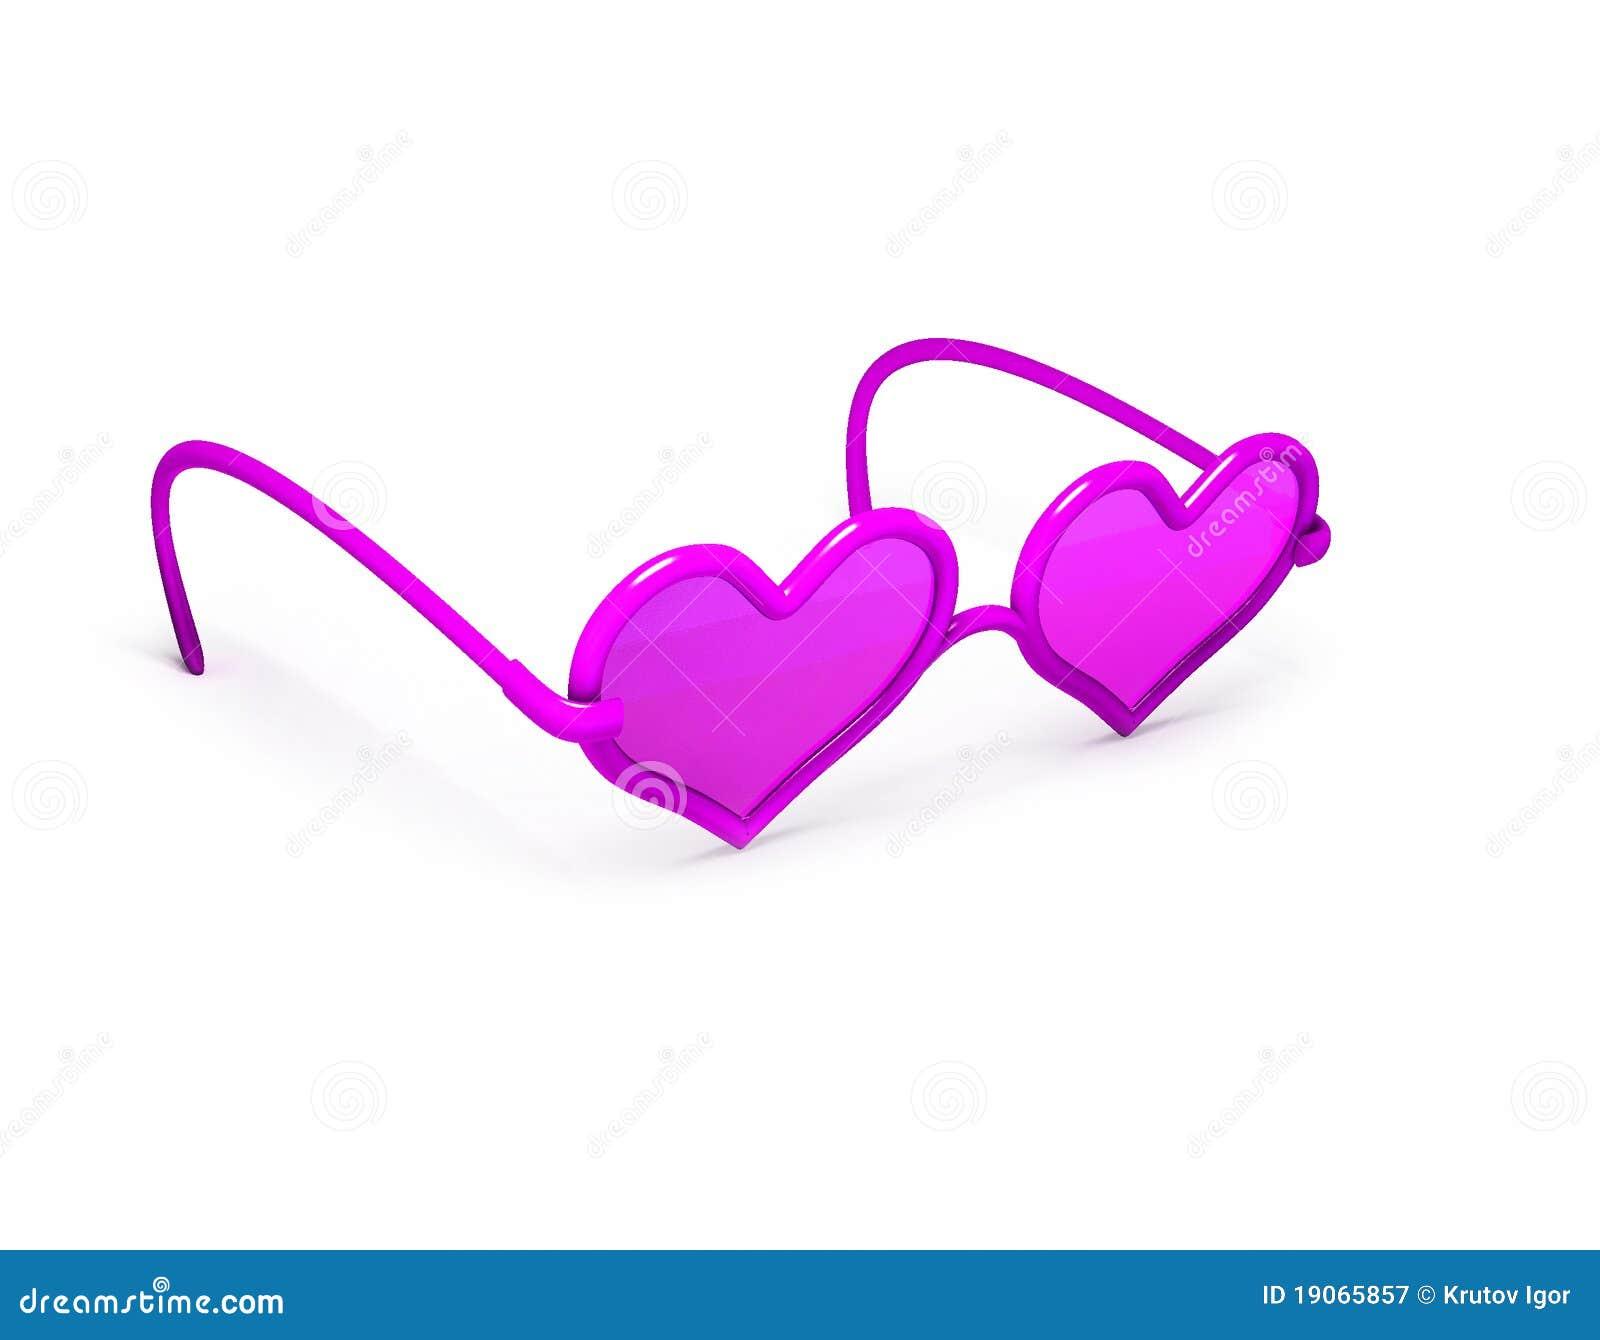 pink-heart-shaped-glasses-19065857.jpg